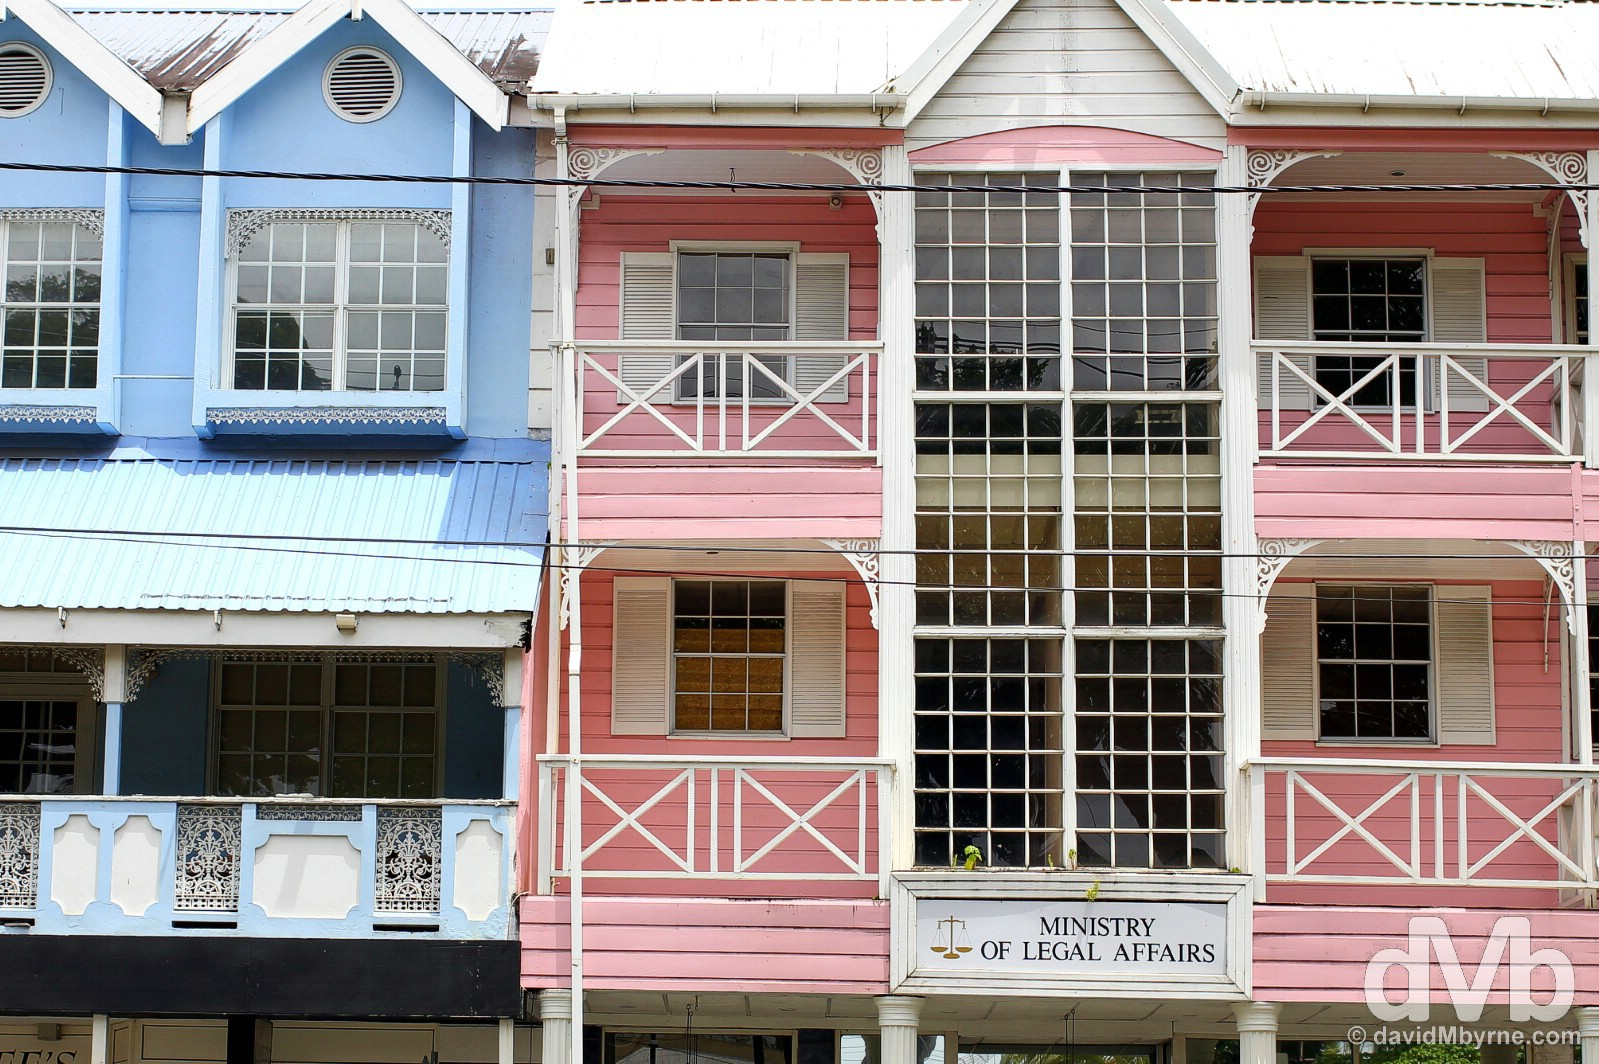 Wooden buildings lining Bourbon Street in Castries, St. Lucia, Lesser Antilles. June 14, 2015.